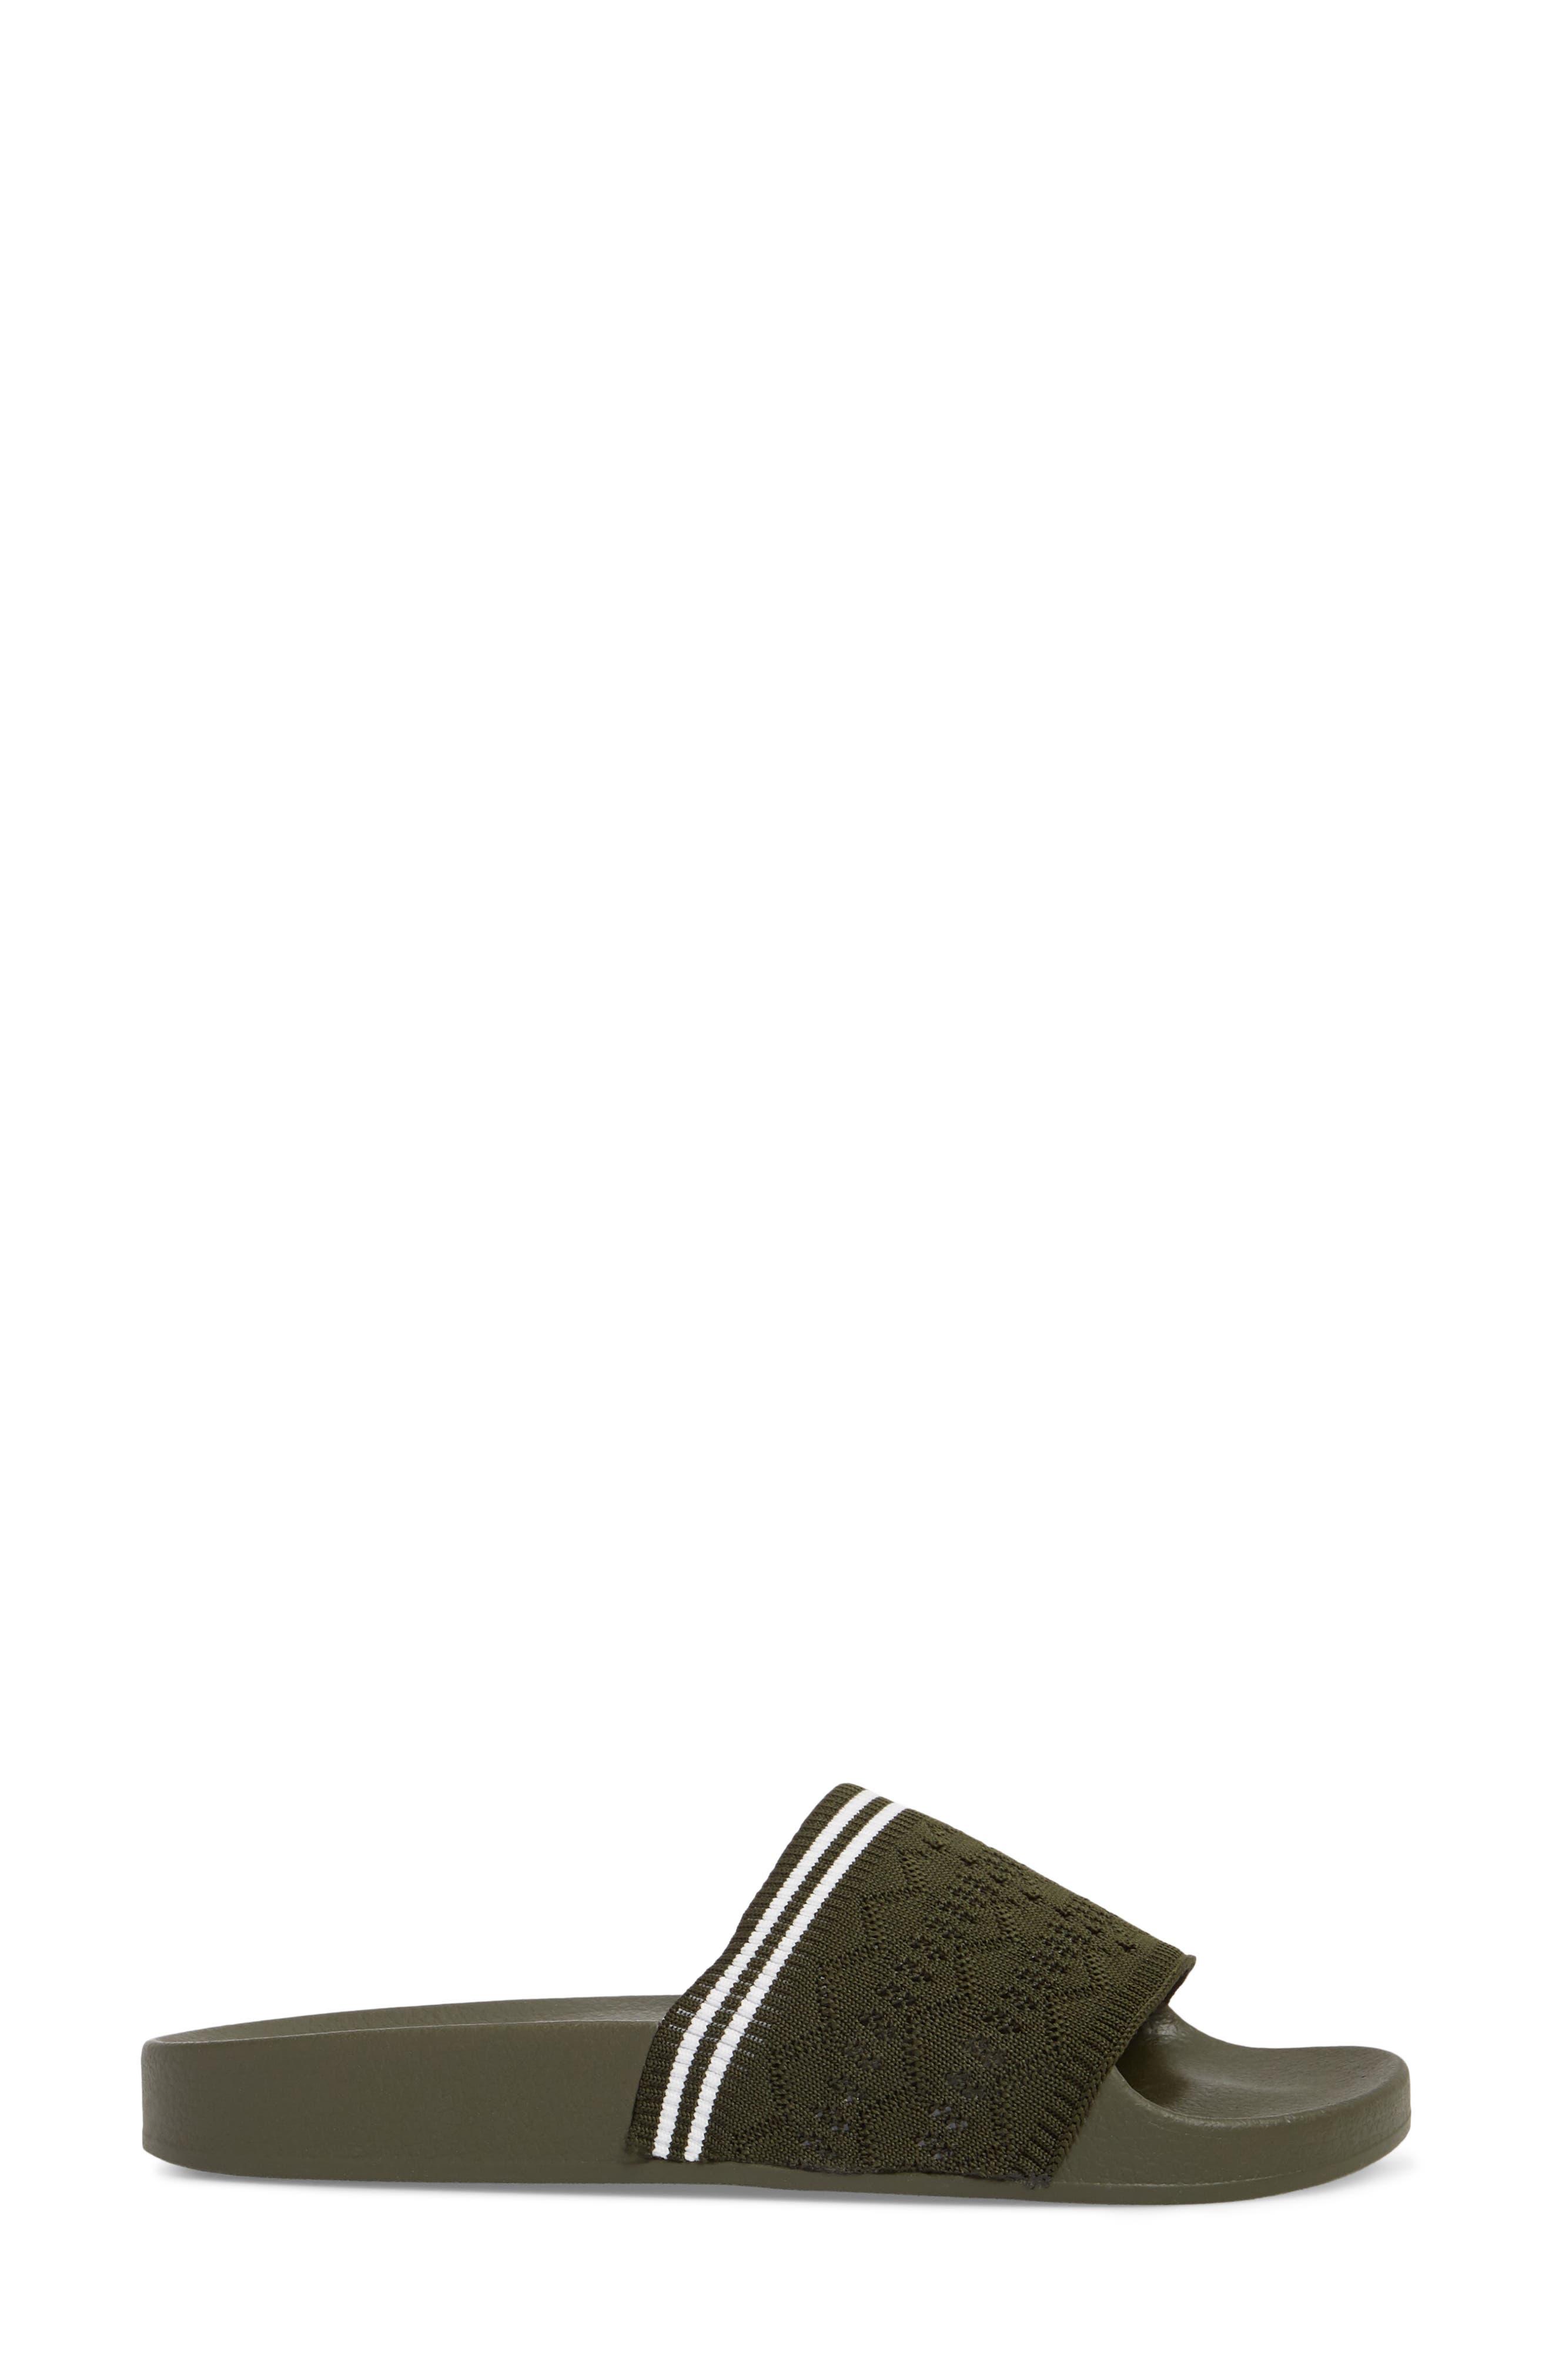 Vibe Sock Knit Slide Sandal,                             Alternate thumbnail 12, color,